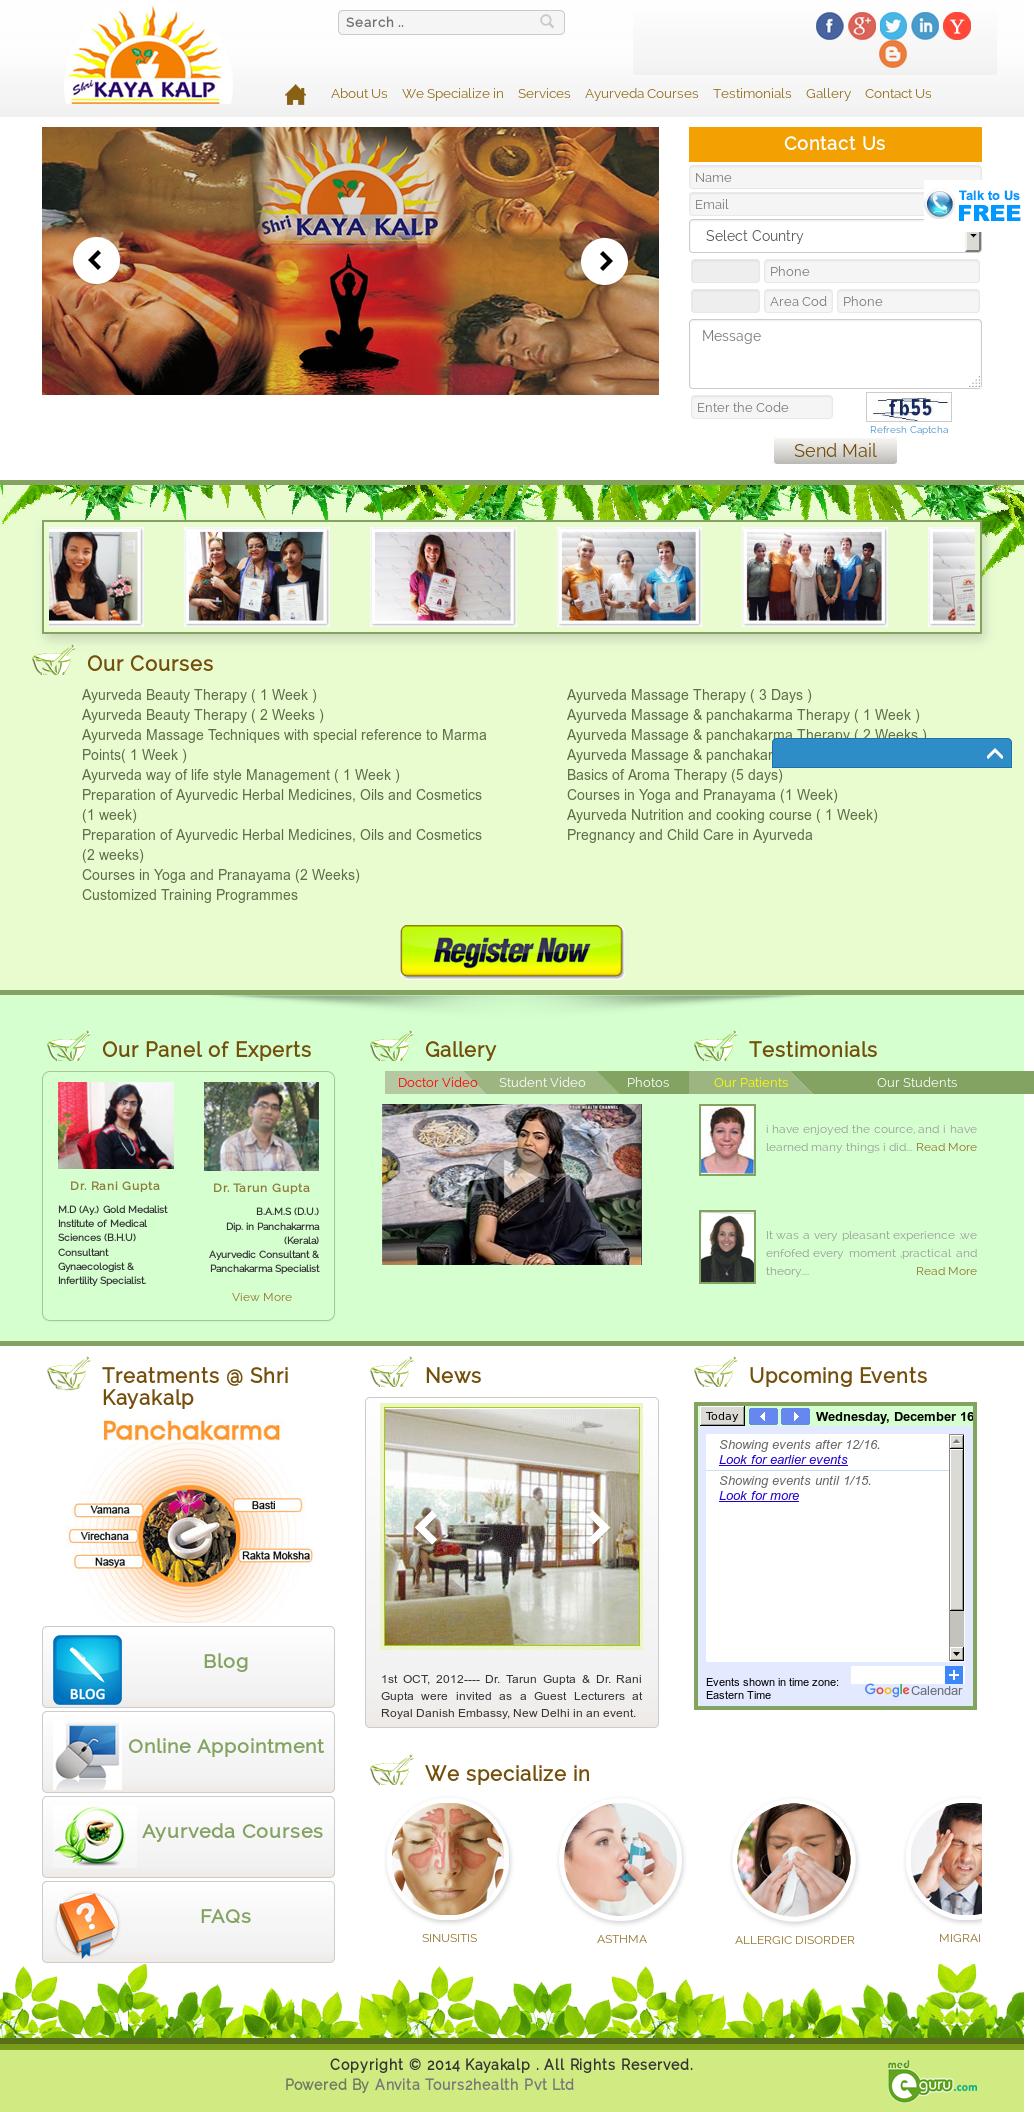 Shri Kaya Kalp Competitors, Revenue and Employees - Owler